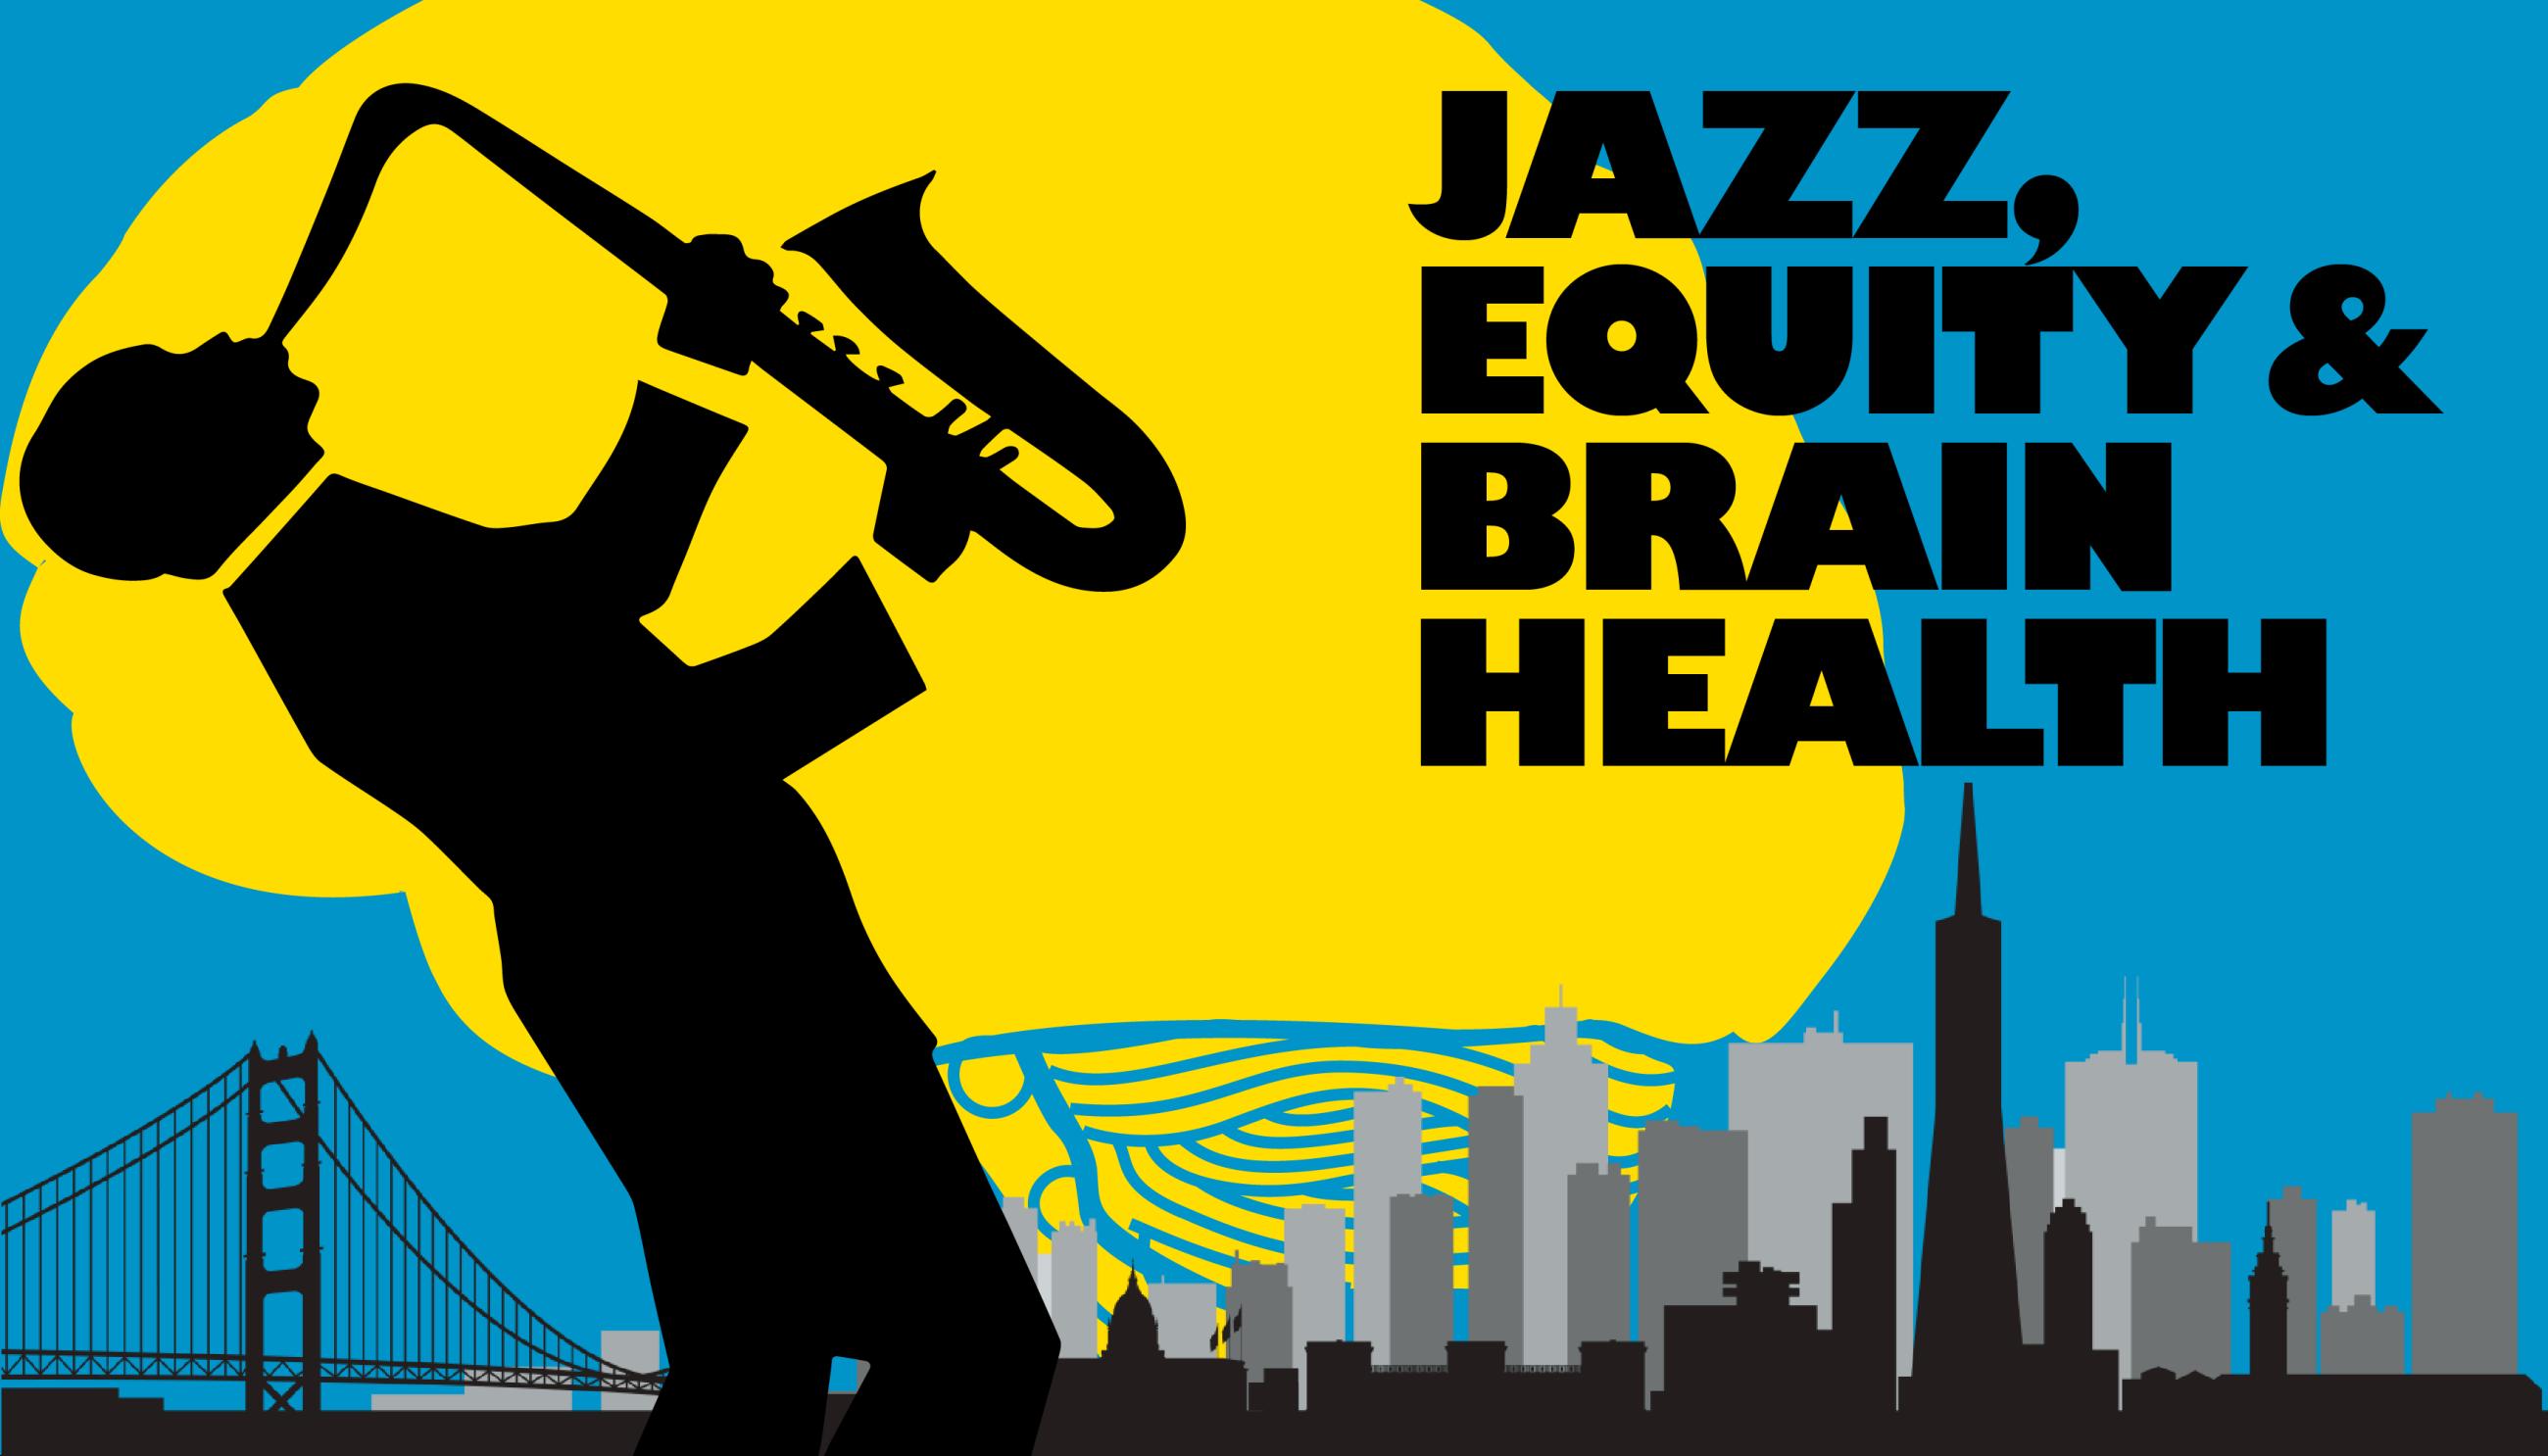 Jazz Equity & Brain Health